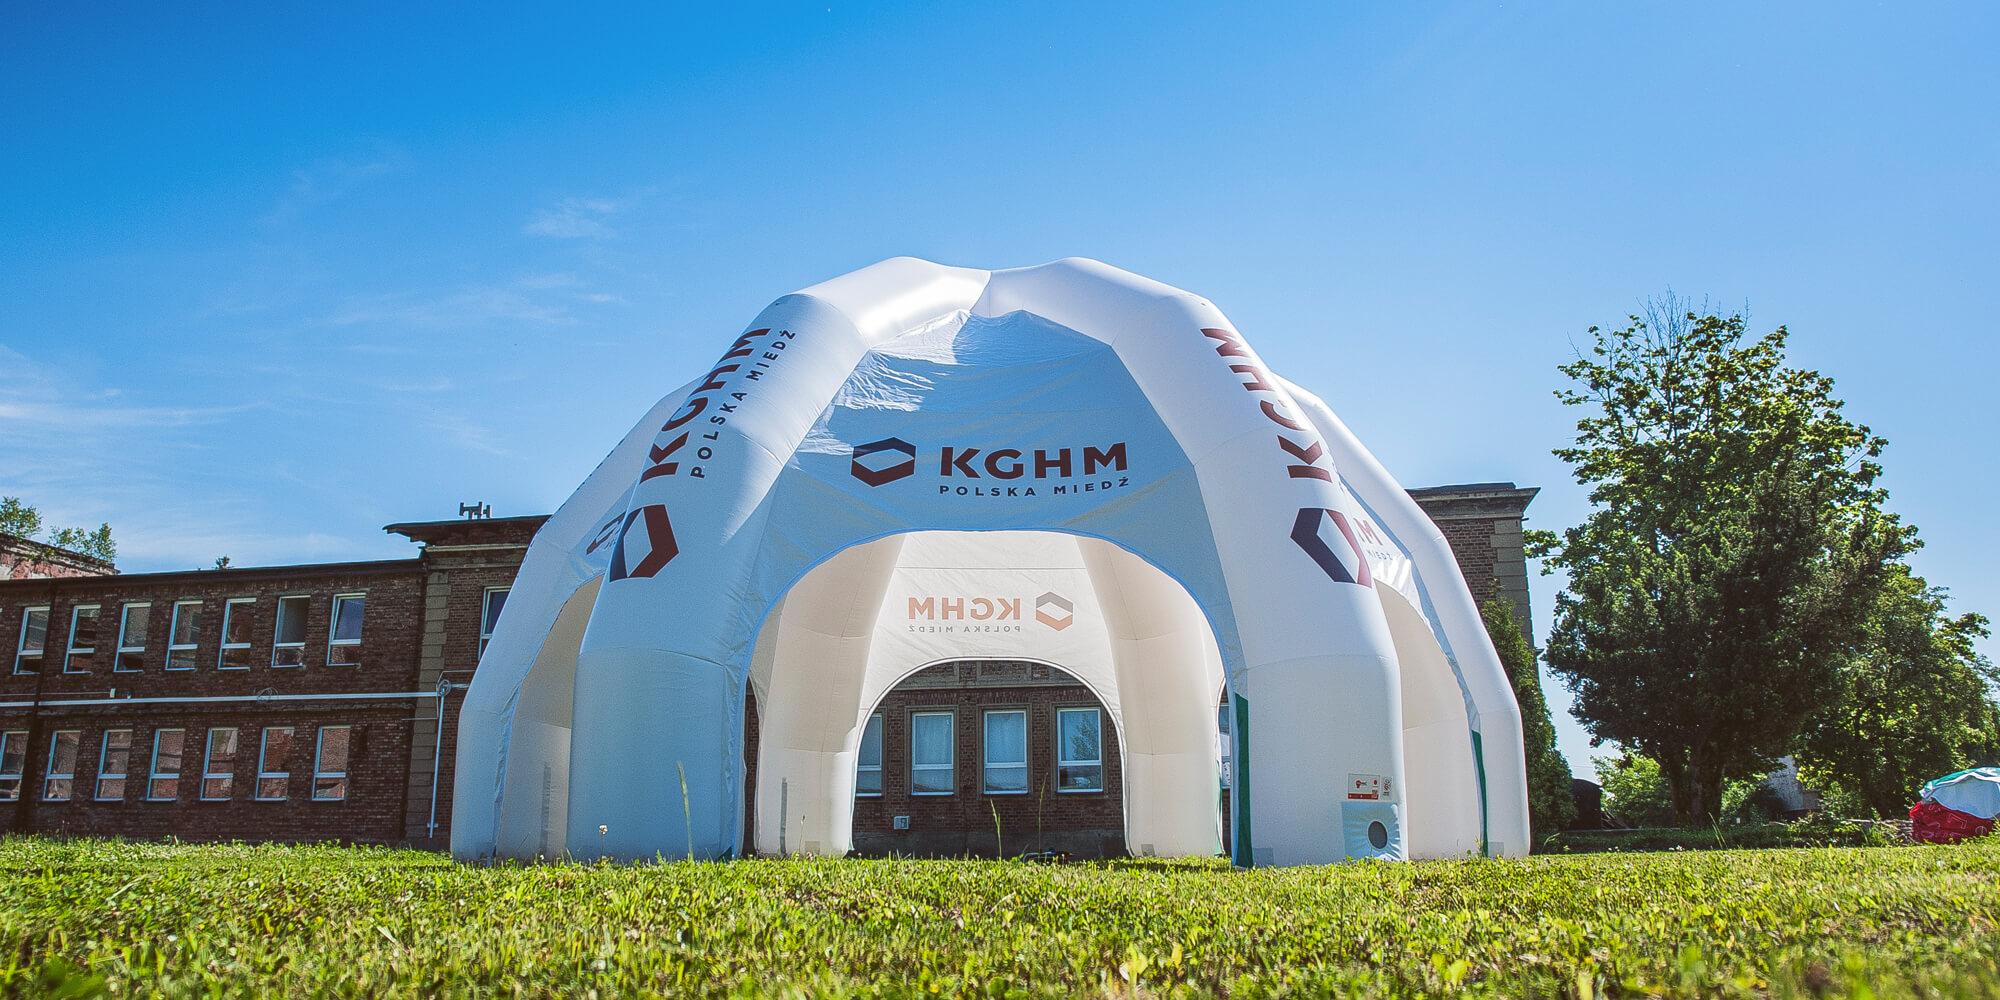 Namiot reklamowy z logotypami KGHM